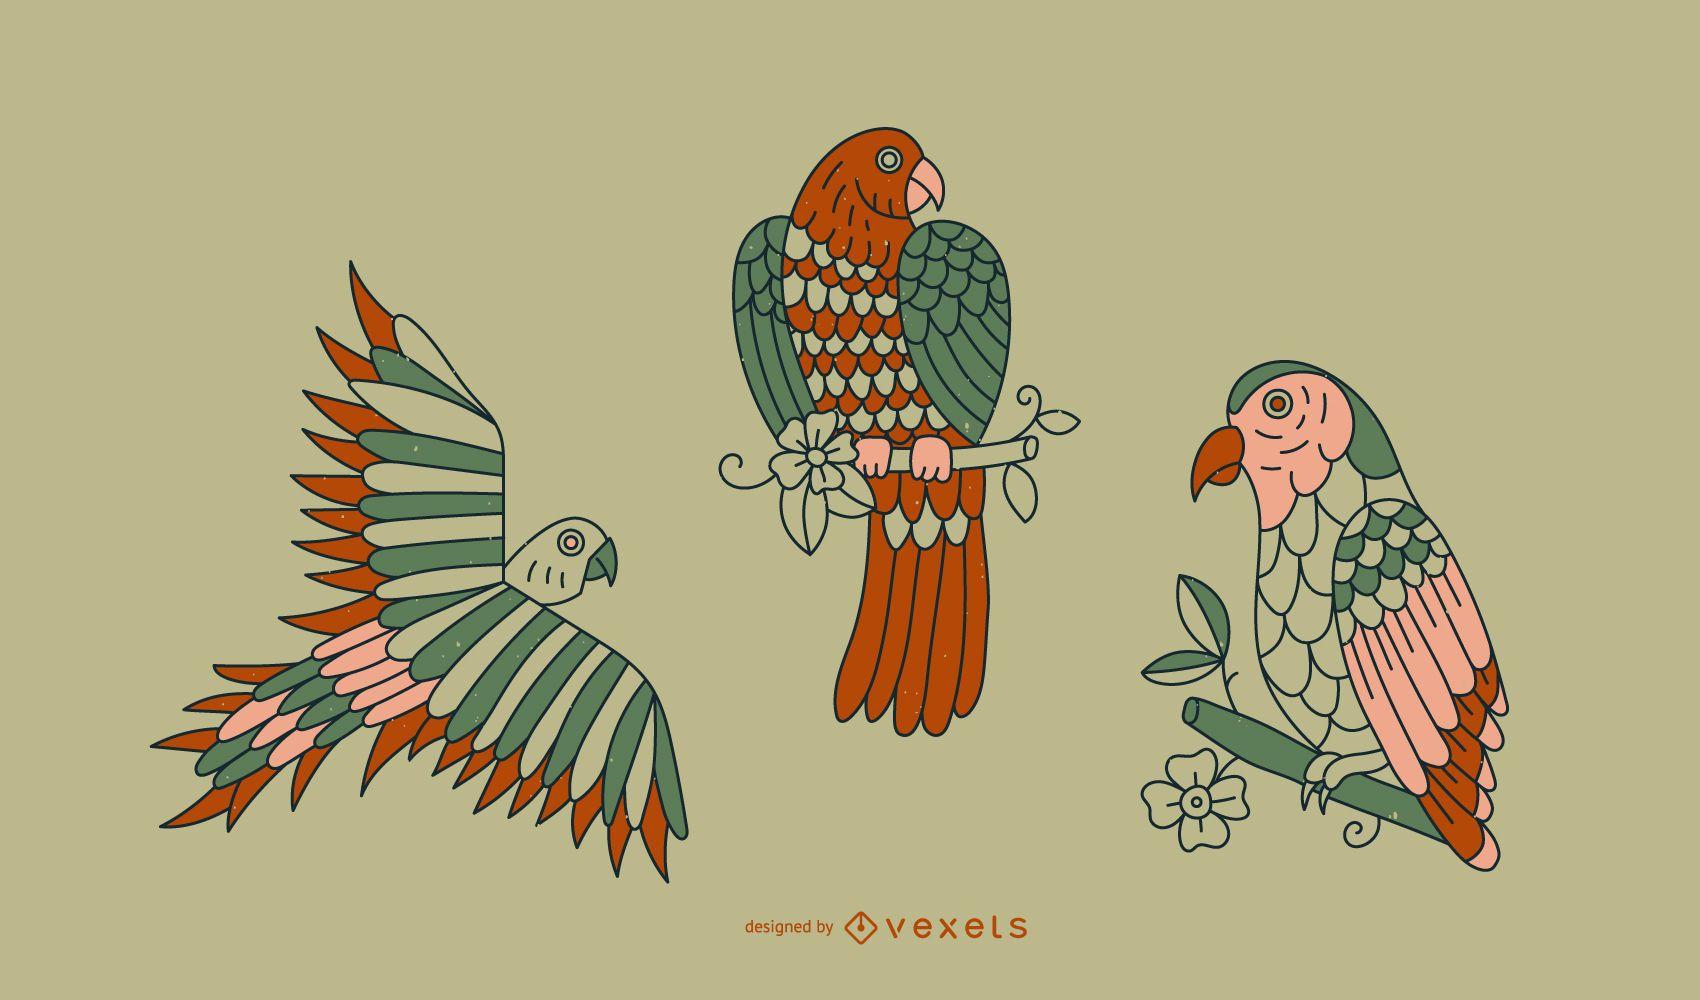 Diseño de línea de tatuaje de loro vintage